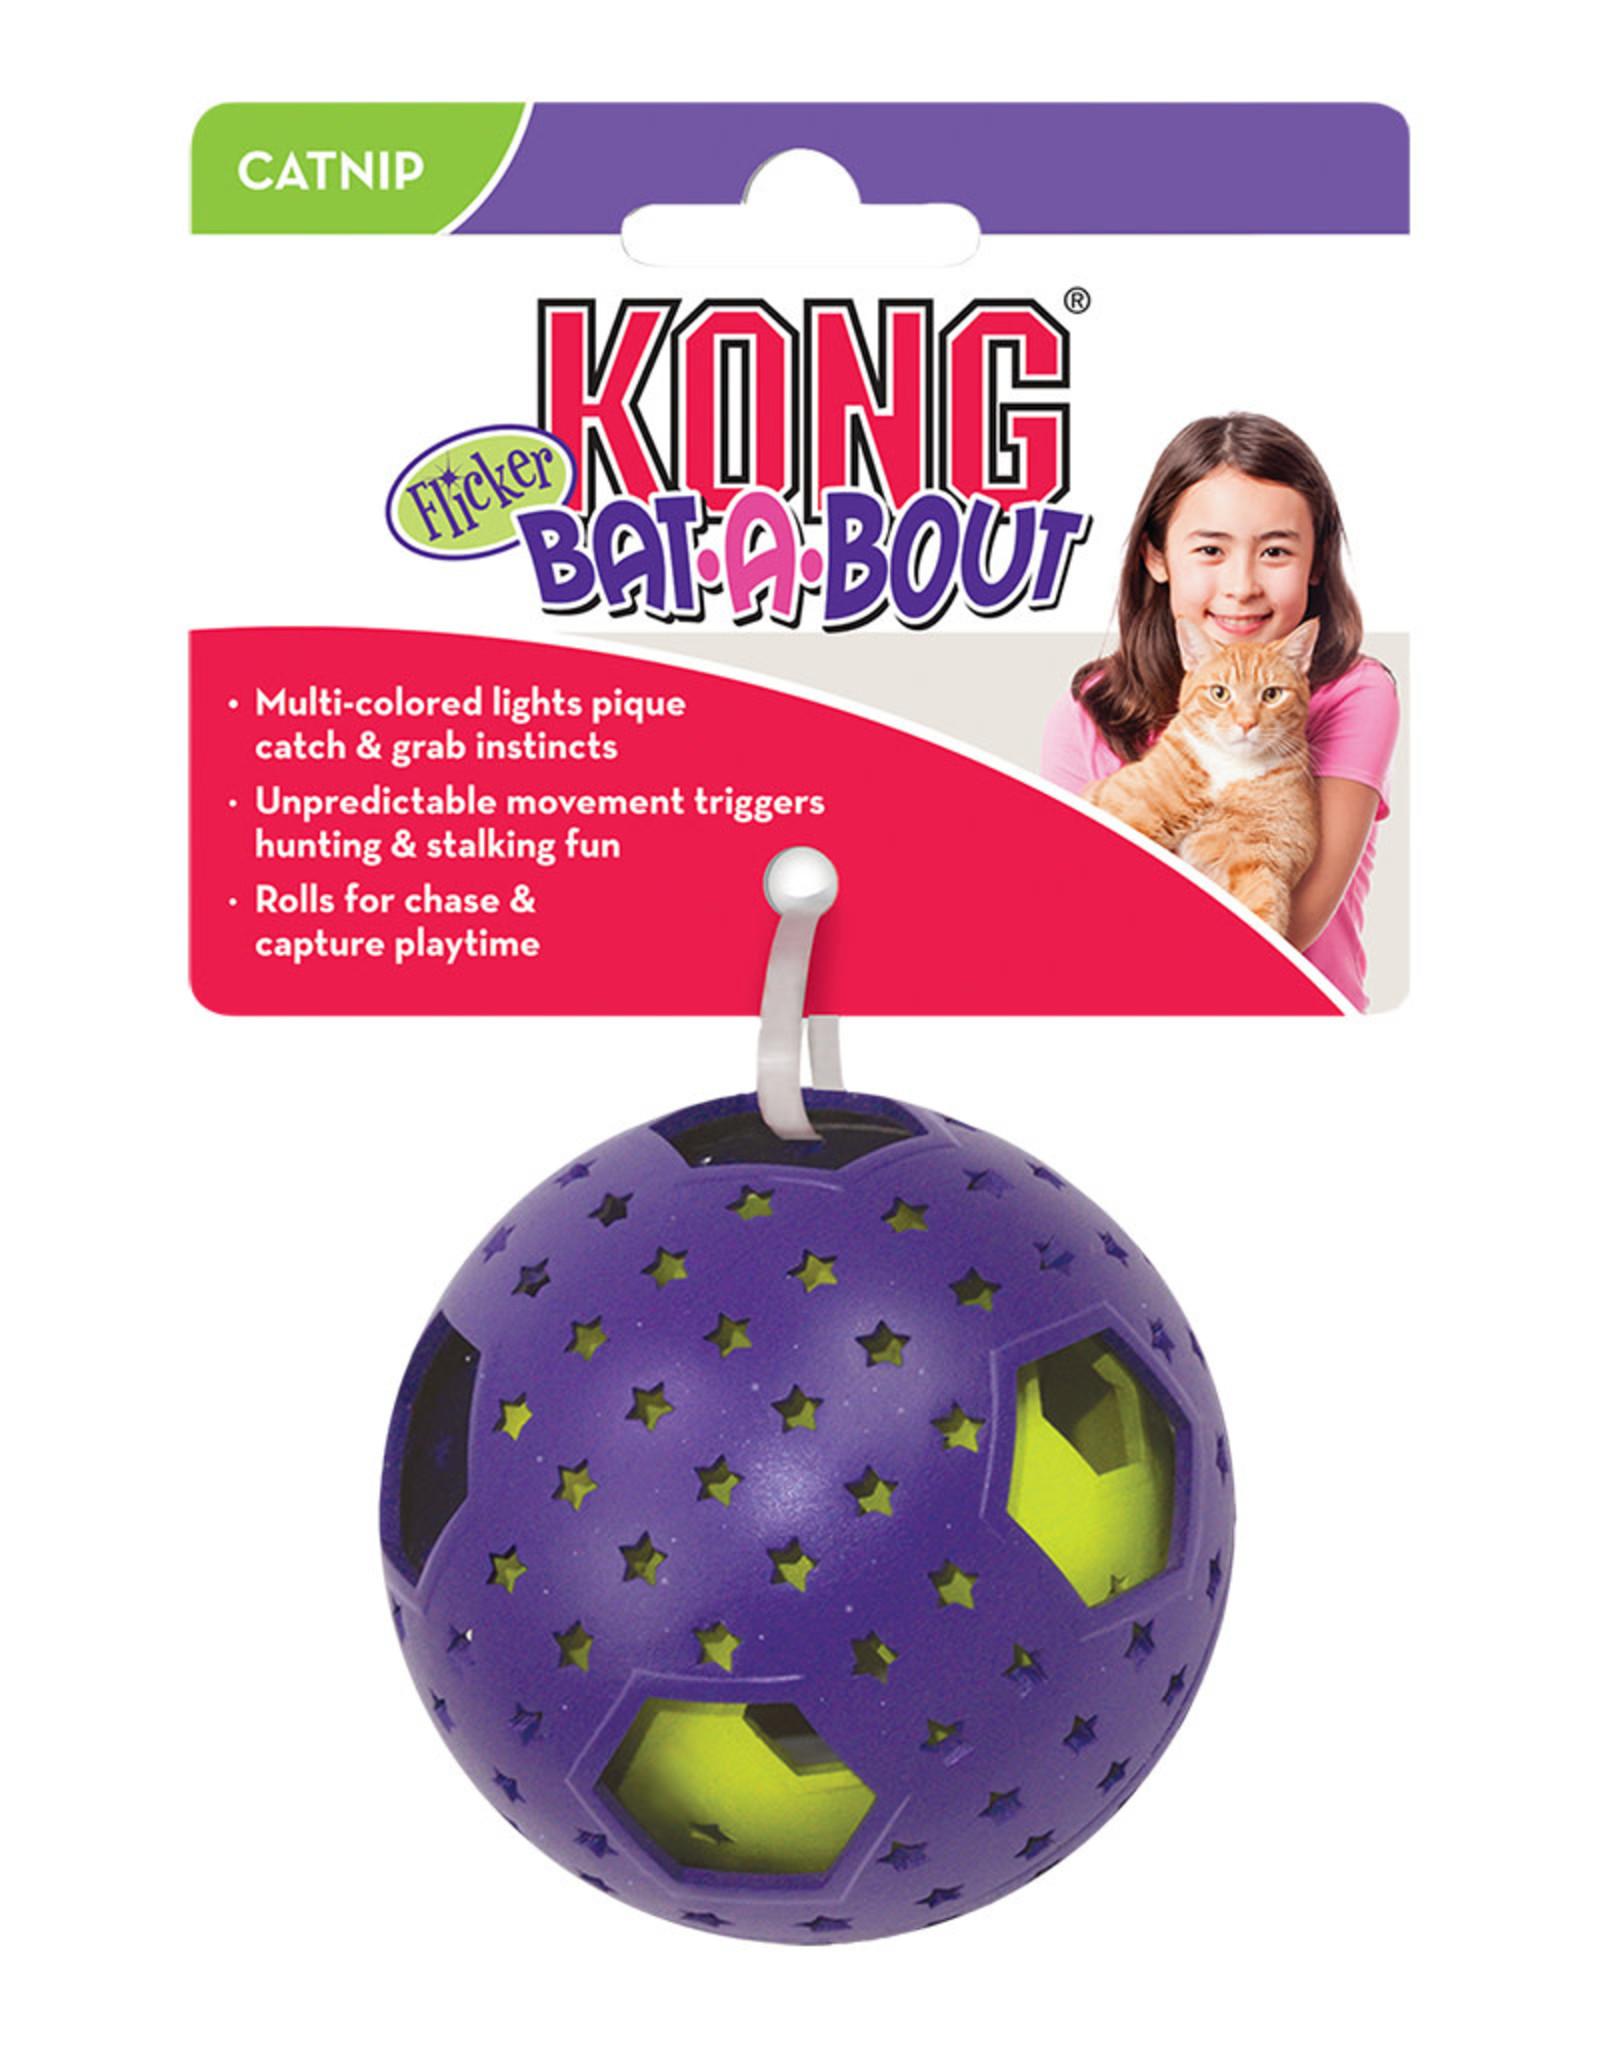 KONG Bat-A-Bout Flicker Disco